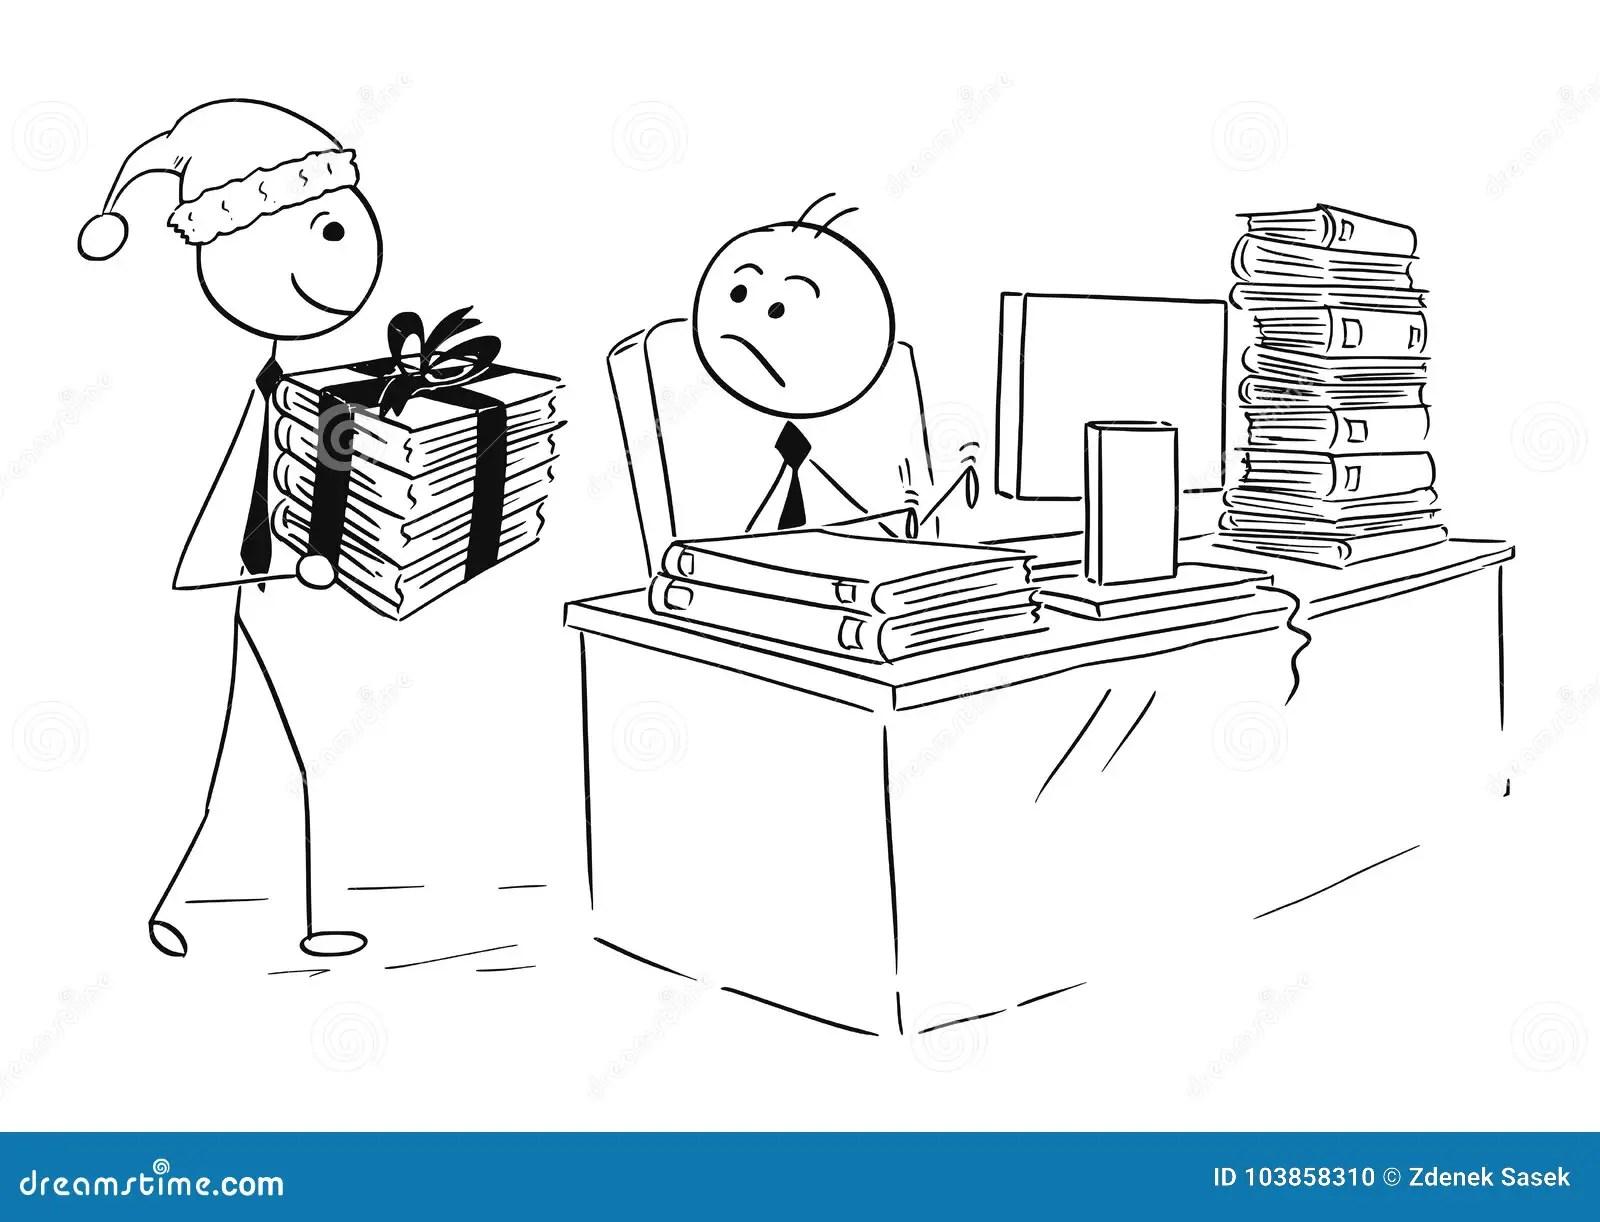 working at computer cartoon